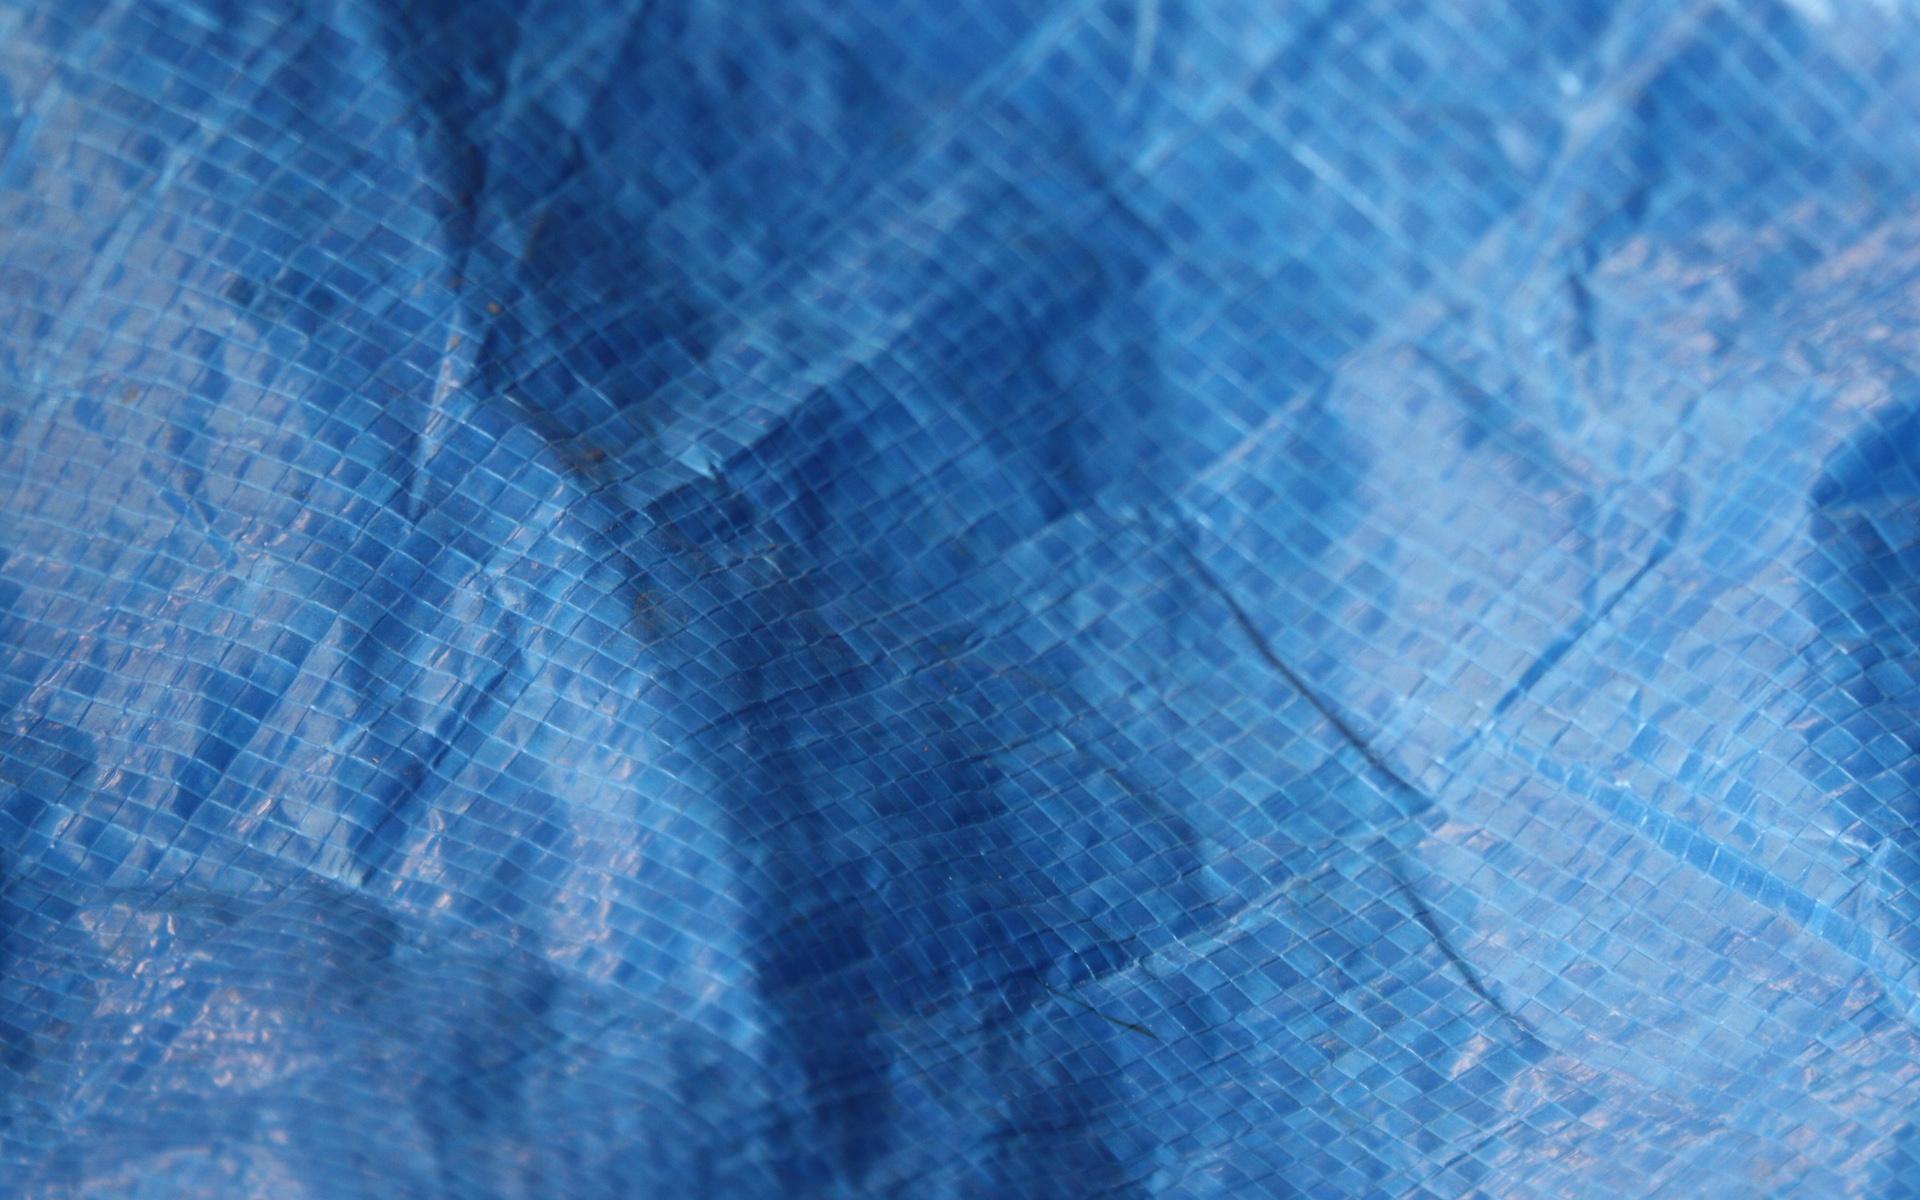 blue plastic faux alligator skin texture 1920x1200 wallpaper download 1920x1200